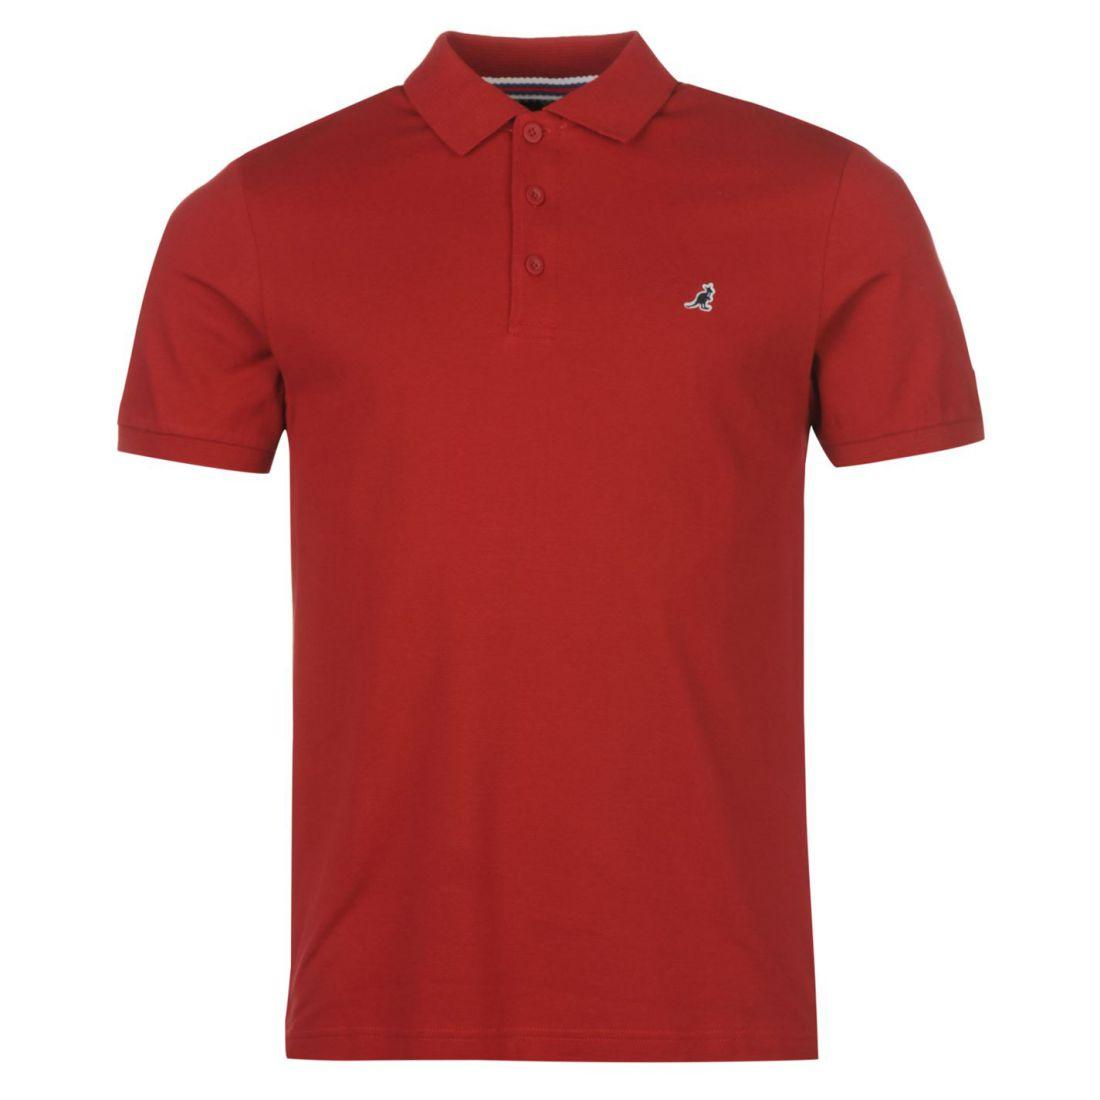 1da813e9587e Kangol Mens Brit Fit Polo T Shirt Tee Top Short Sleeve Classic ...